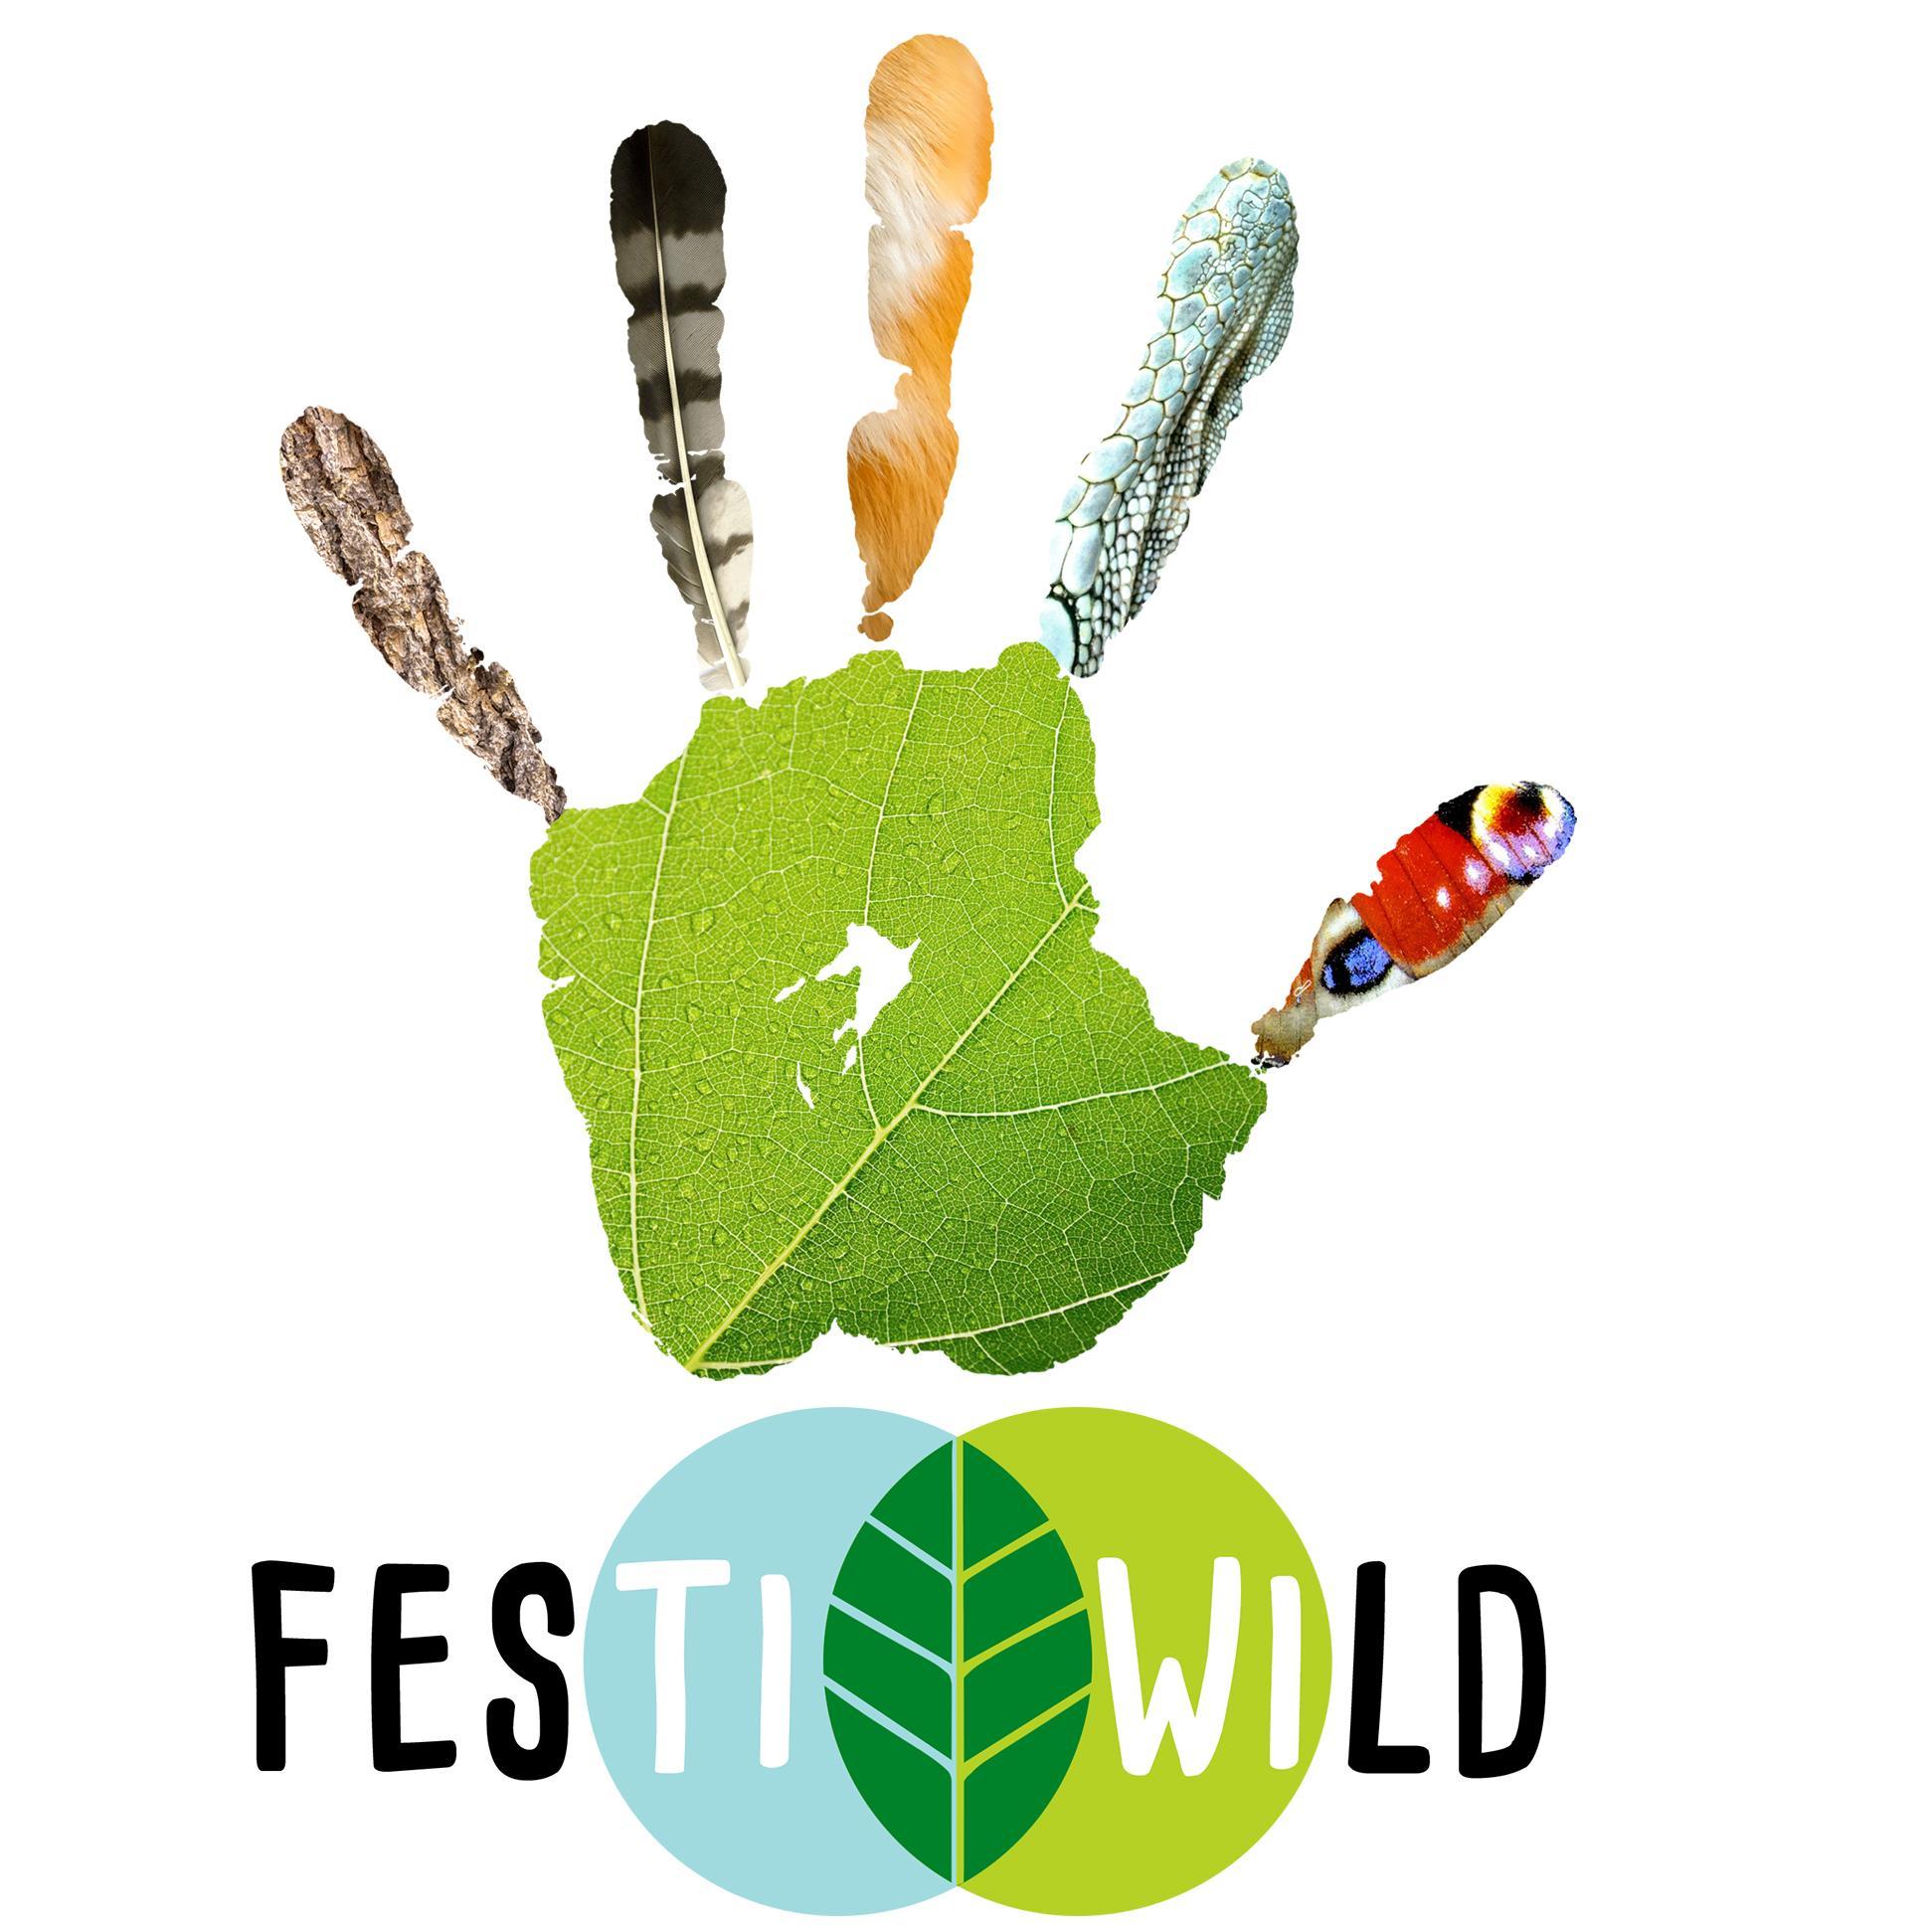 Festiwild logo